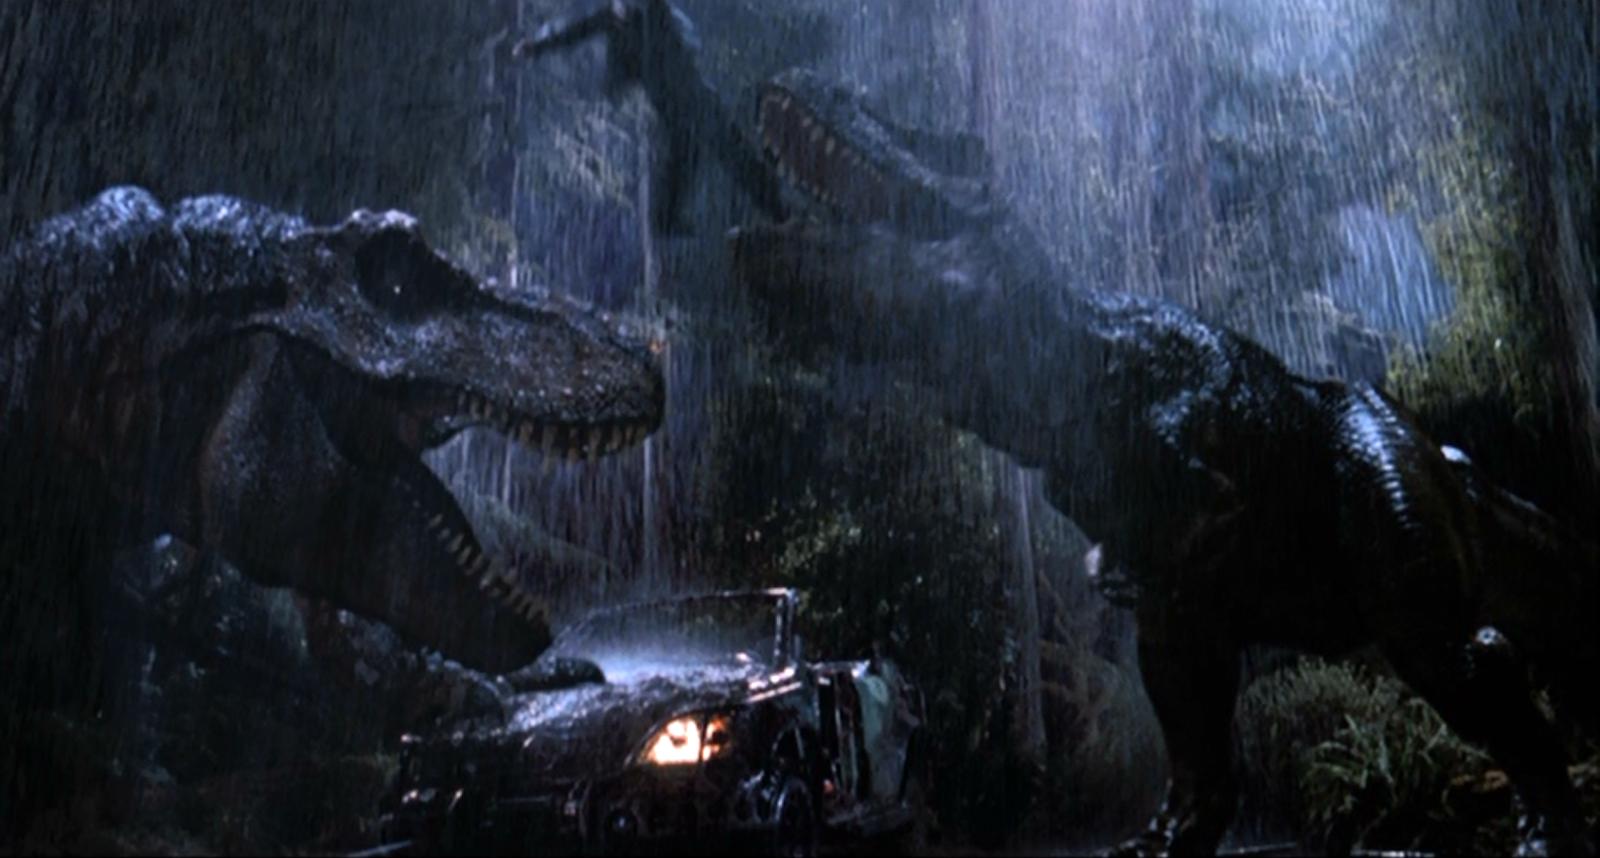 T Rexes Eat Eddie Jurassic Park Photo 36541115 Fanpop